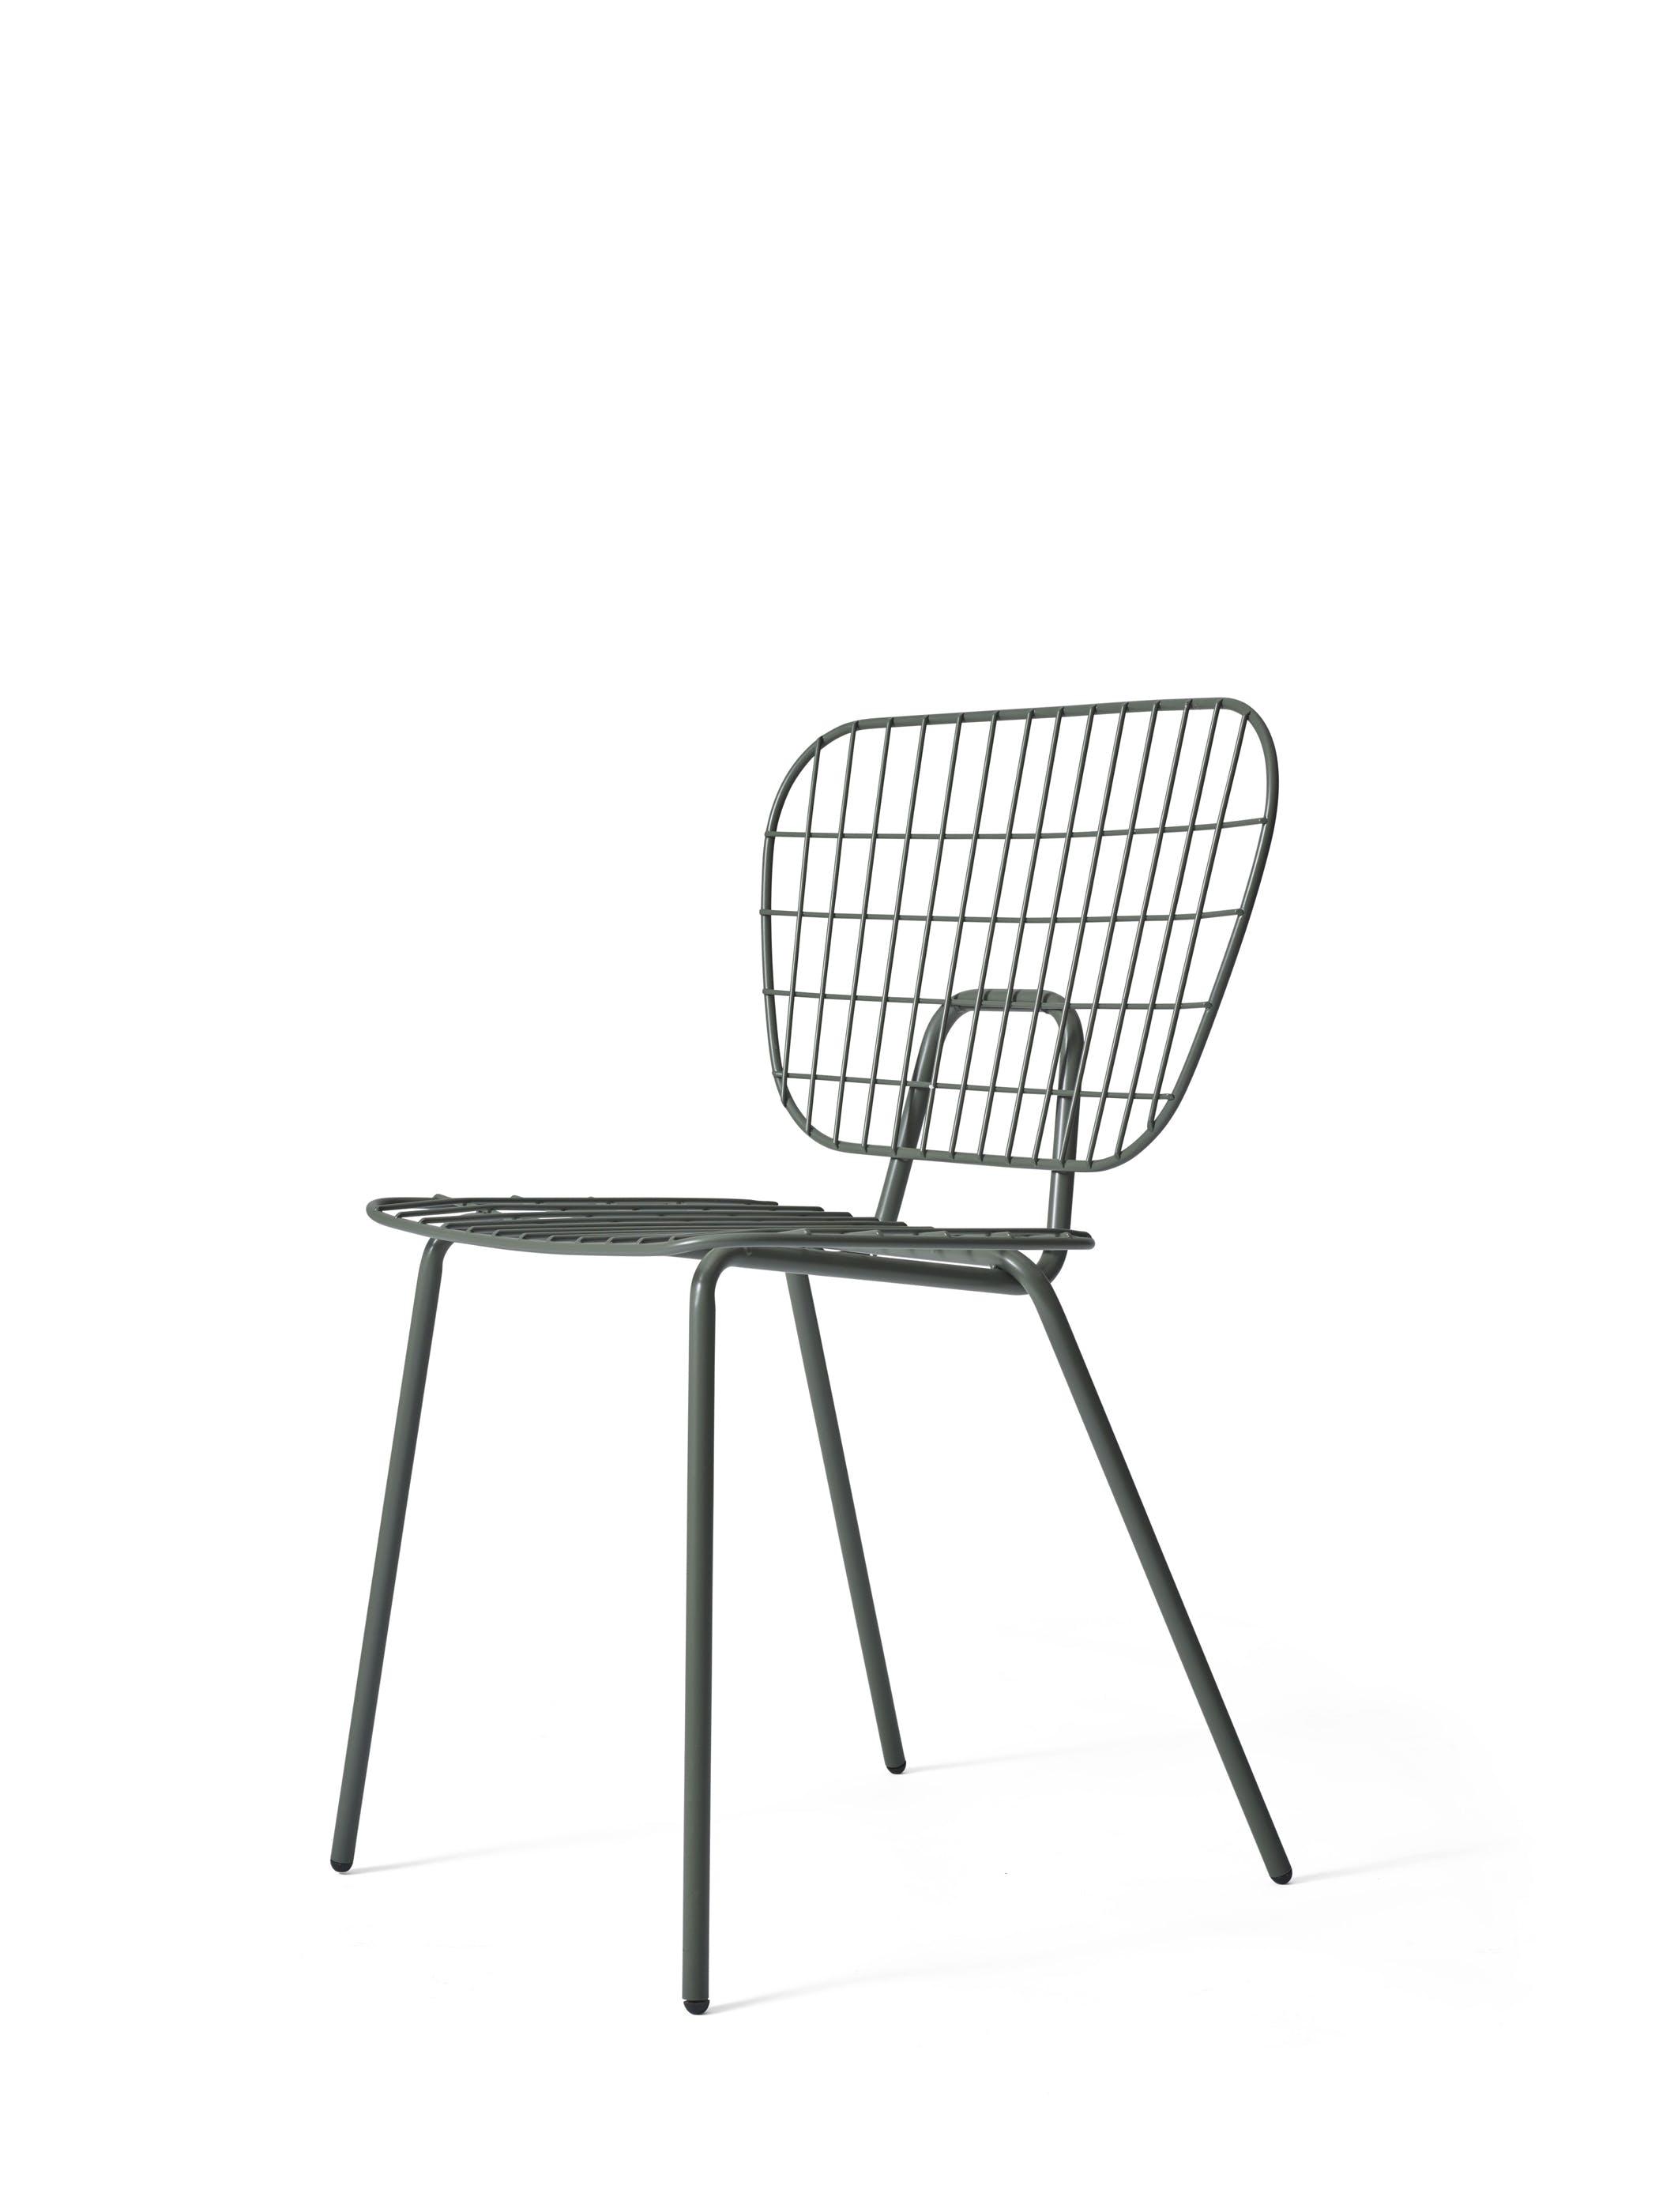 9520499 Wm String Dining Chair Dark Green 02 Download 72Dpi Jpg Rgb 290503